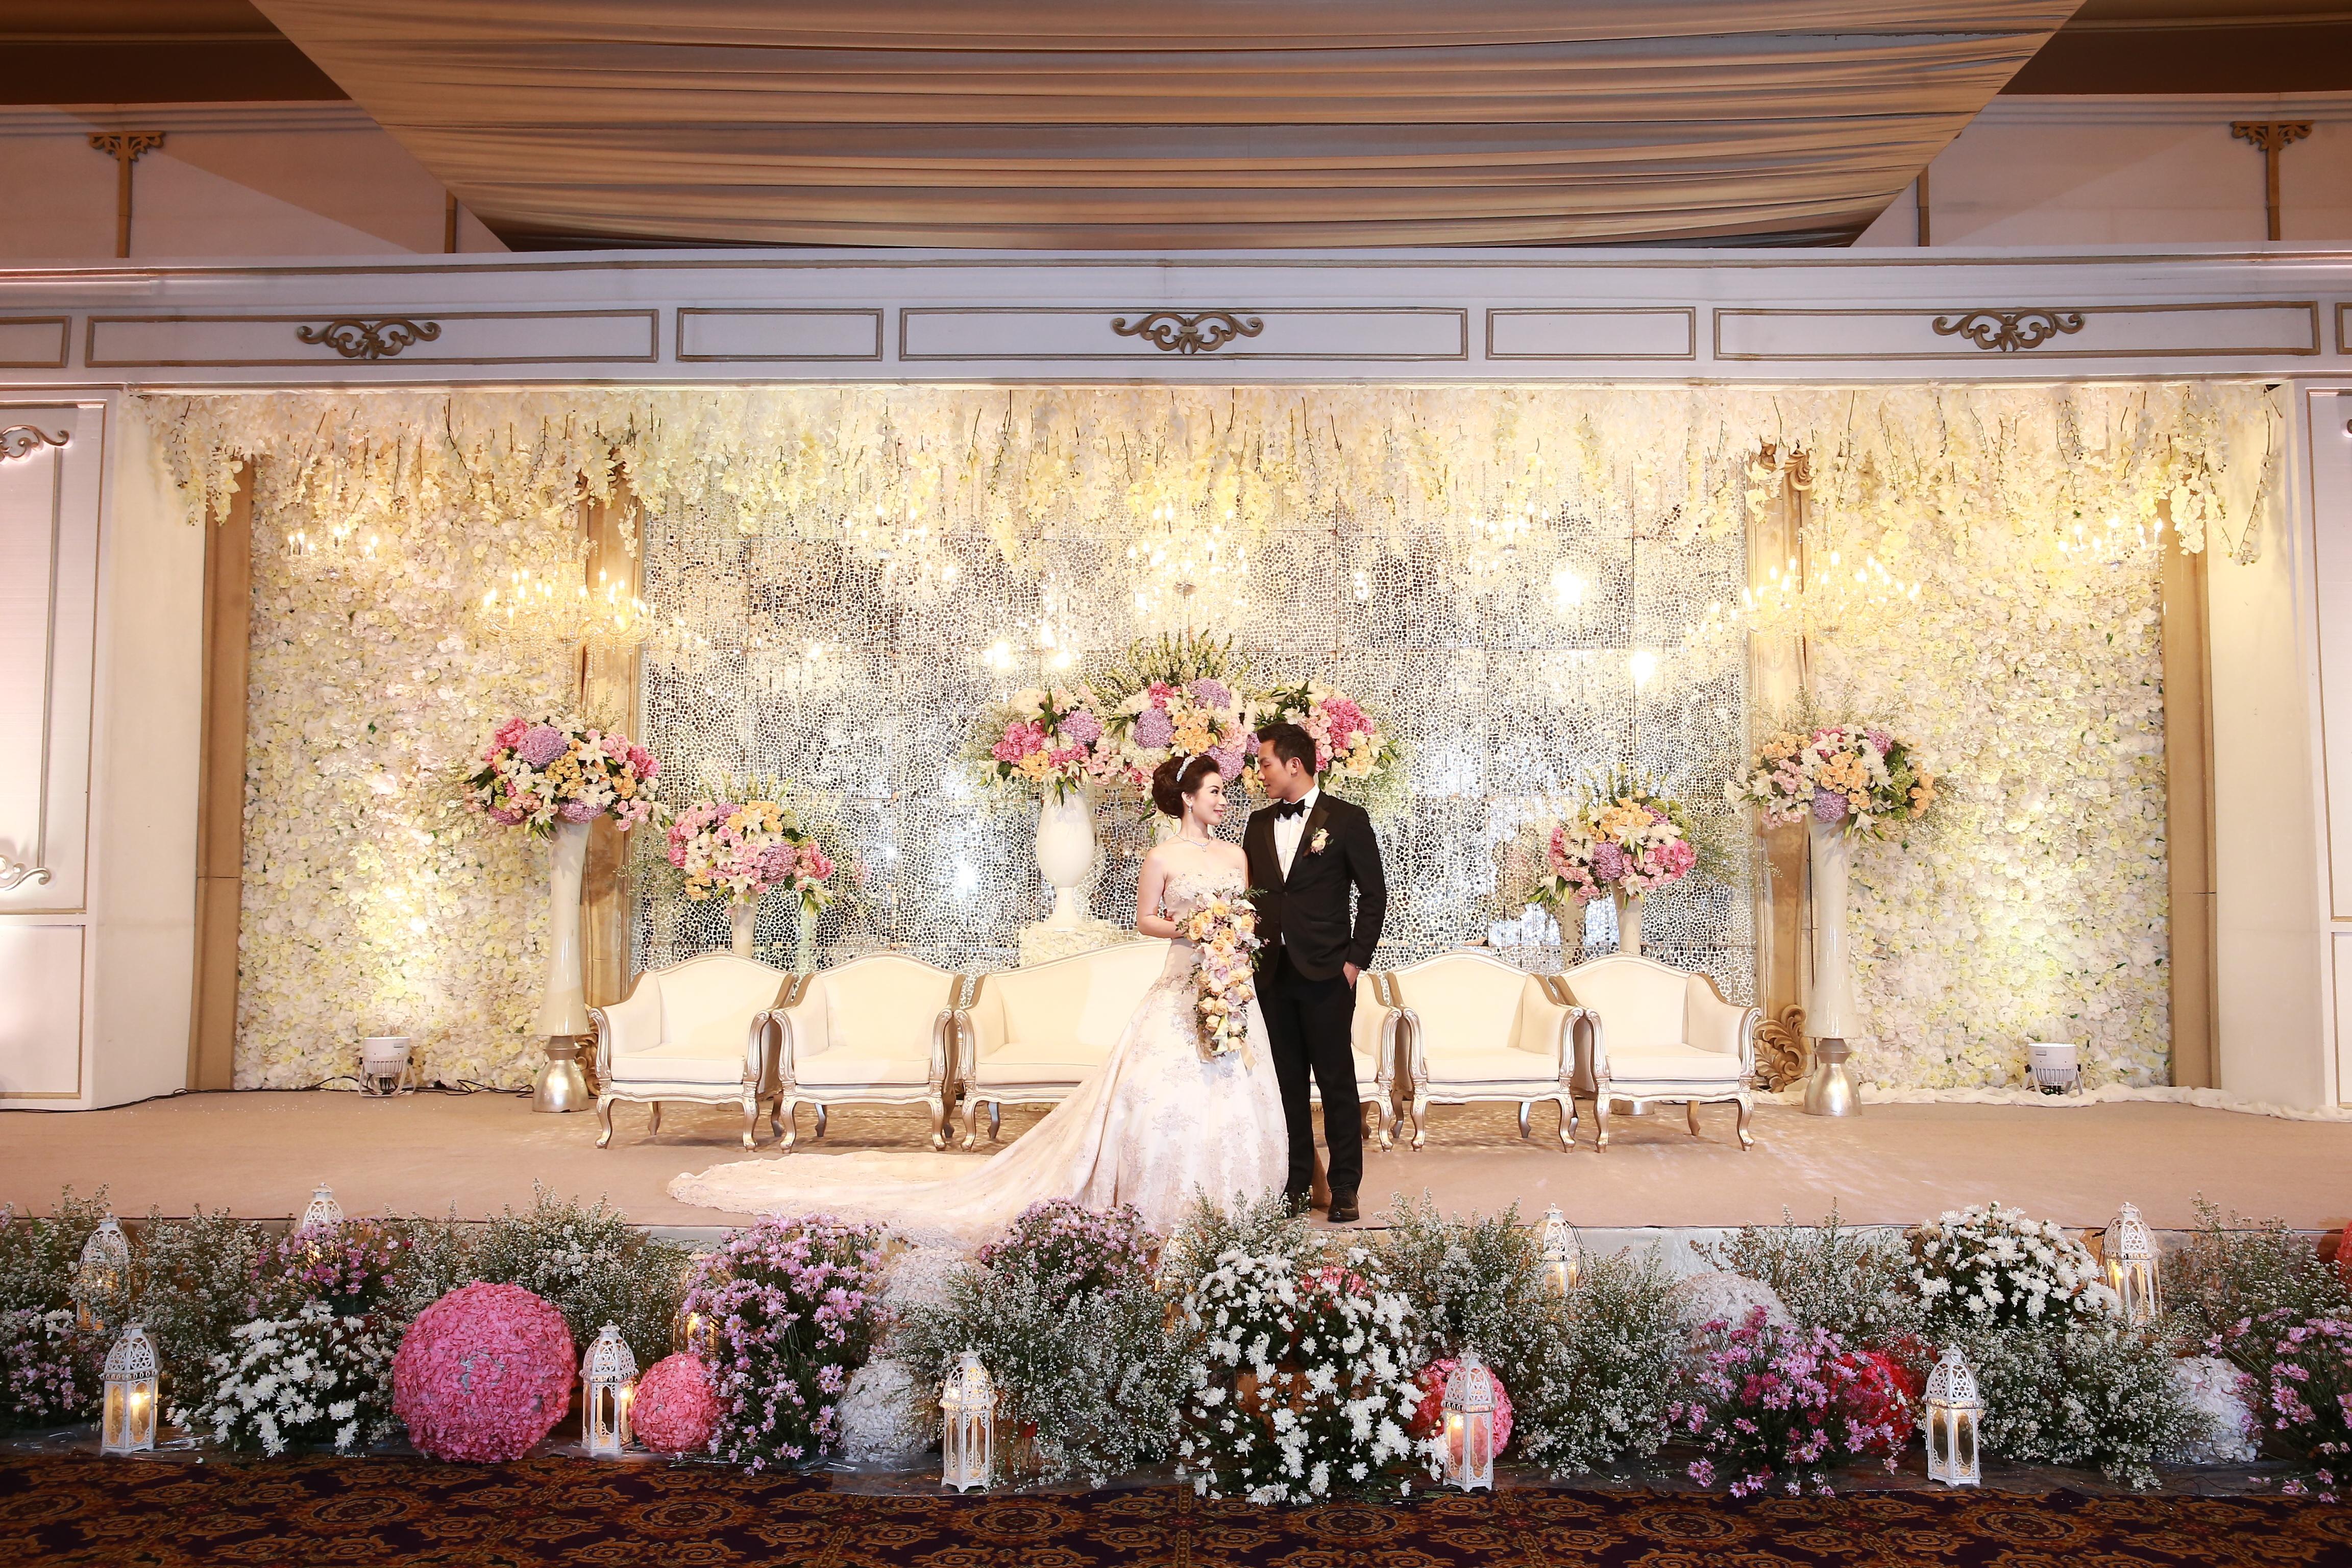 Image decoration wedding decoration lighting in jakarta image decoration wedding decoration lighting in jakarta bridestory junglespirit Gallery